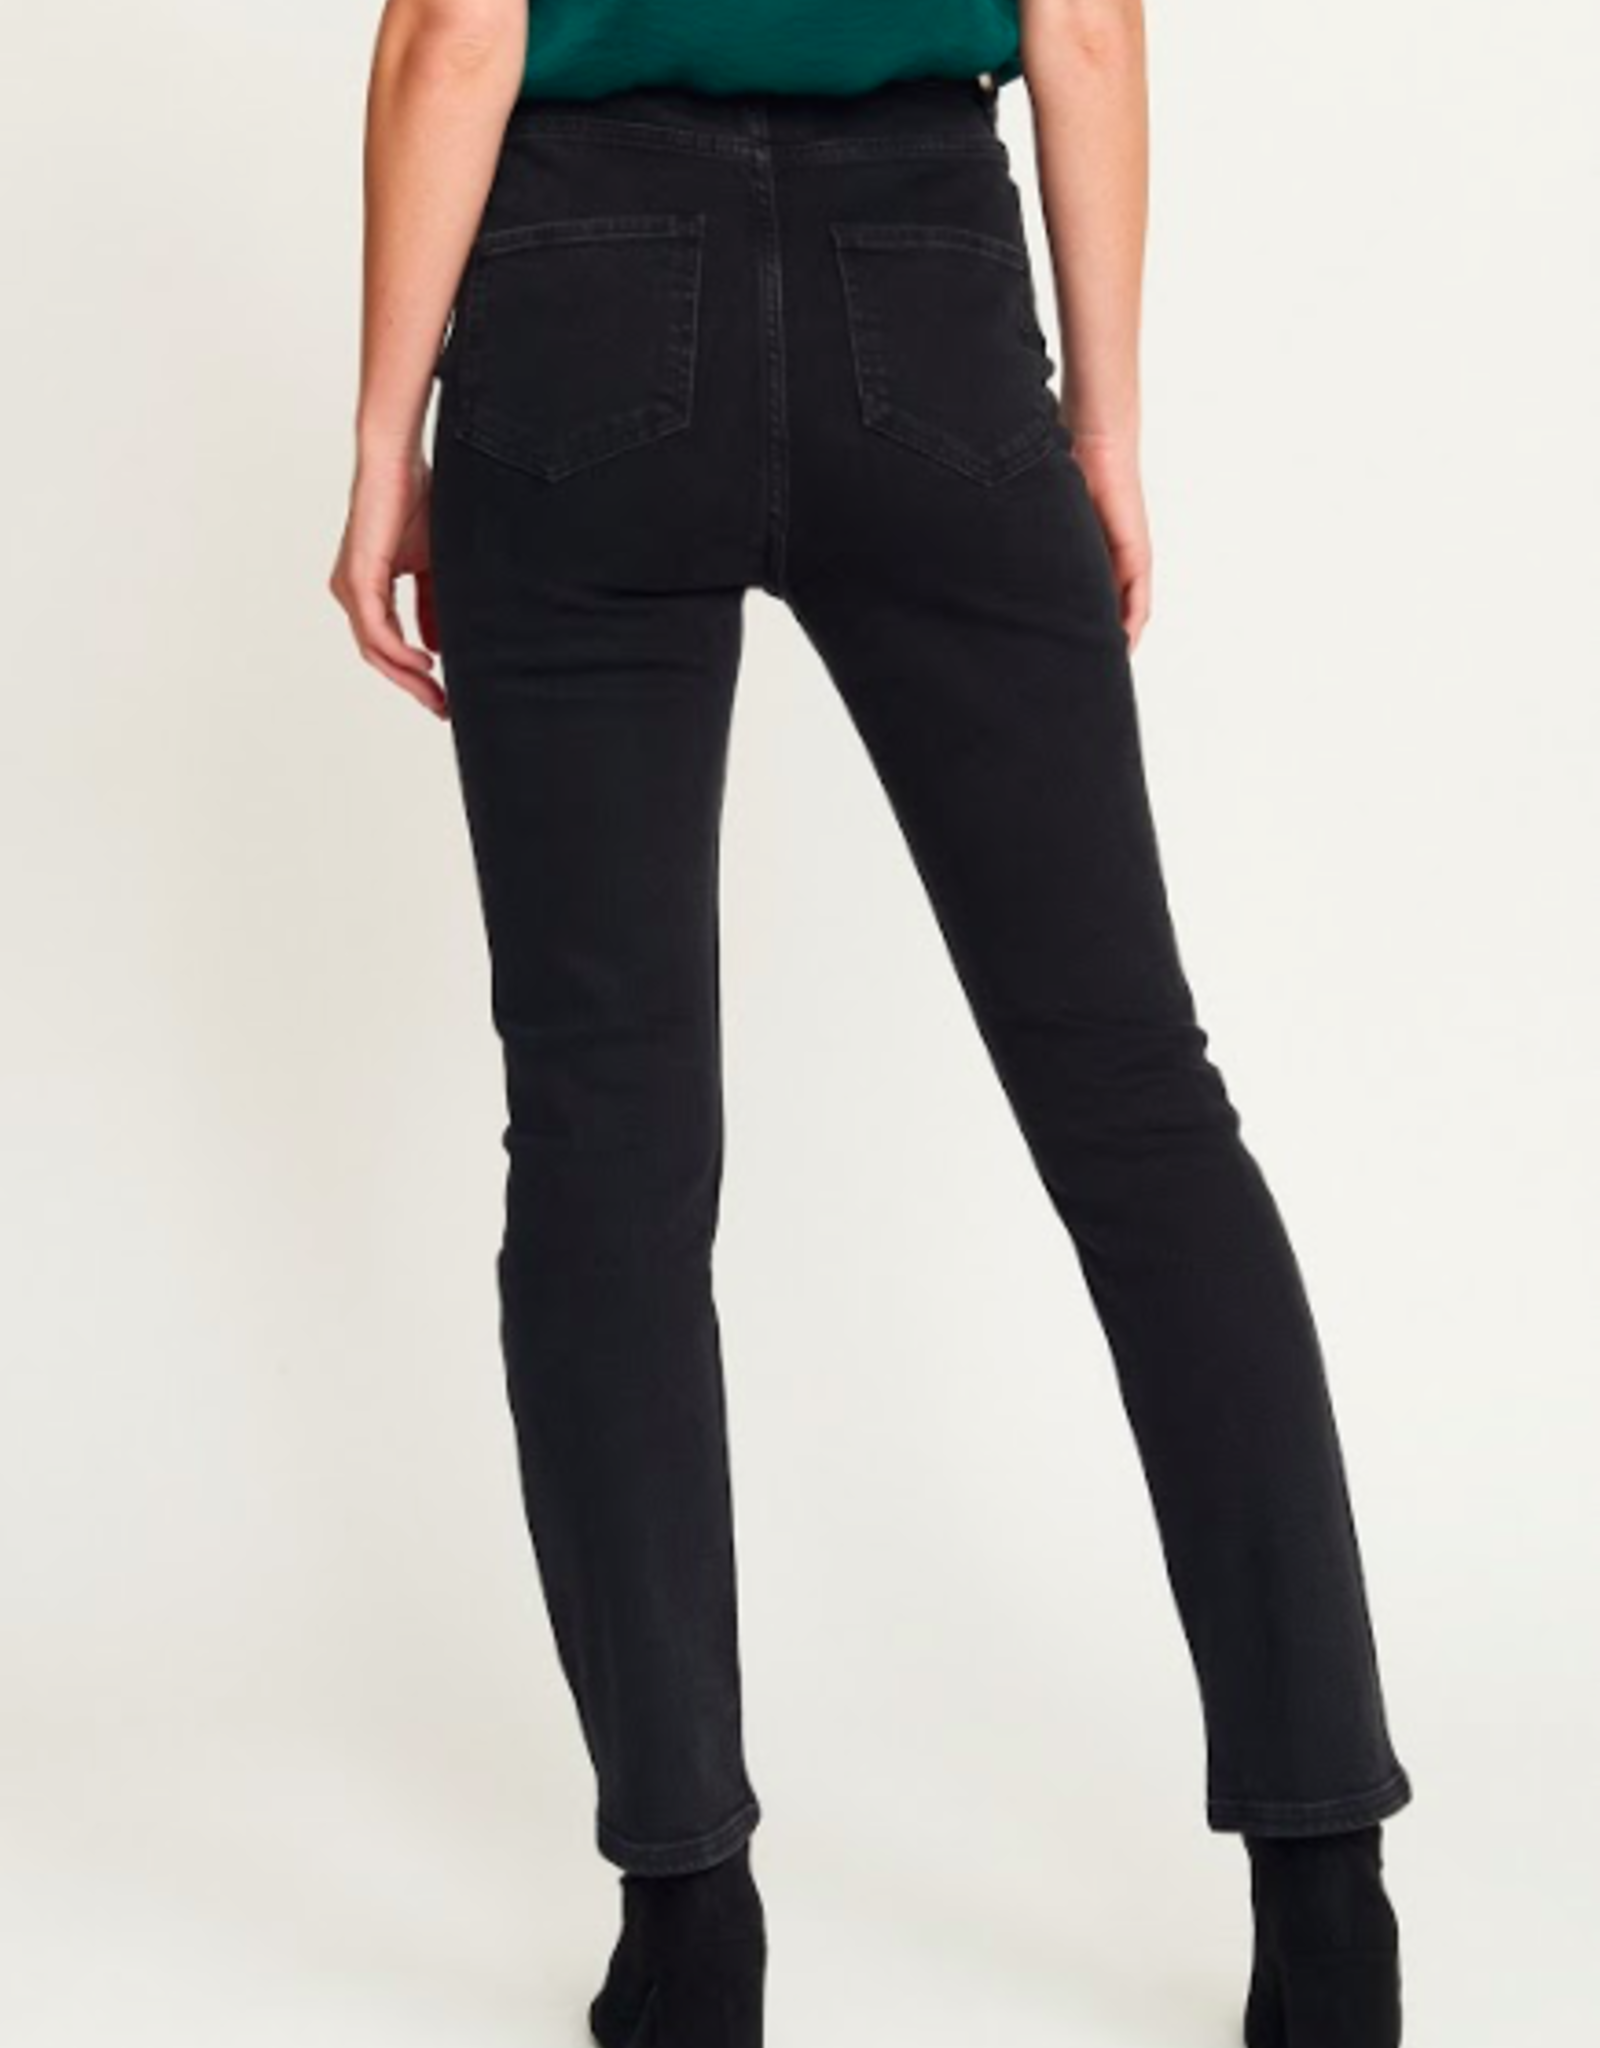 Rut & Circle Rut & Circle Nora High waist jeans